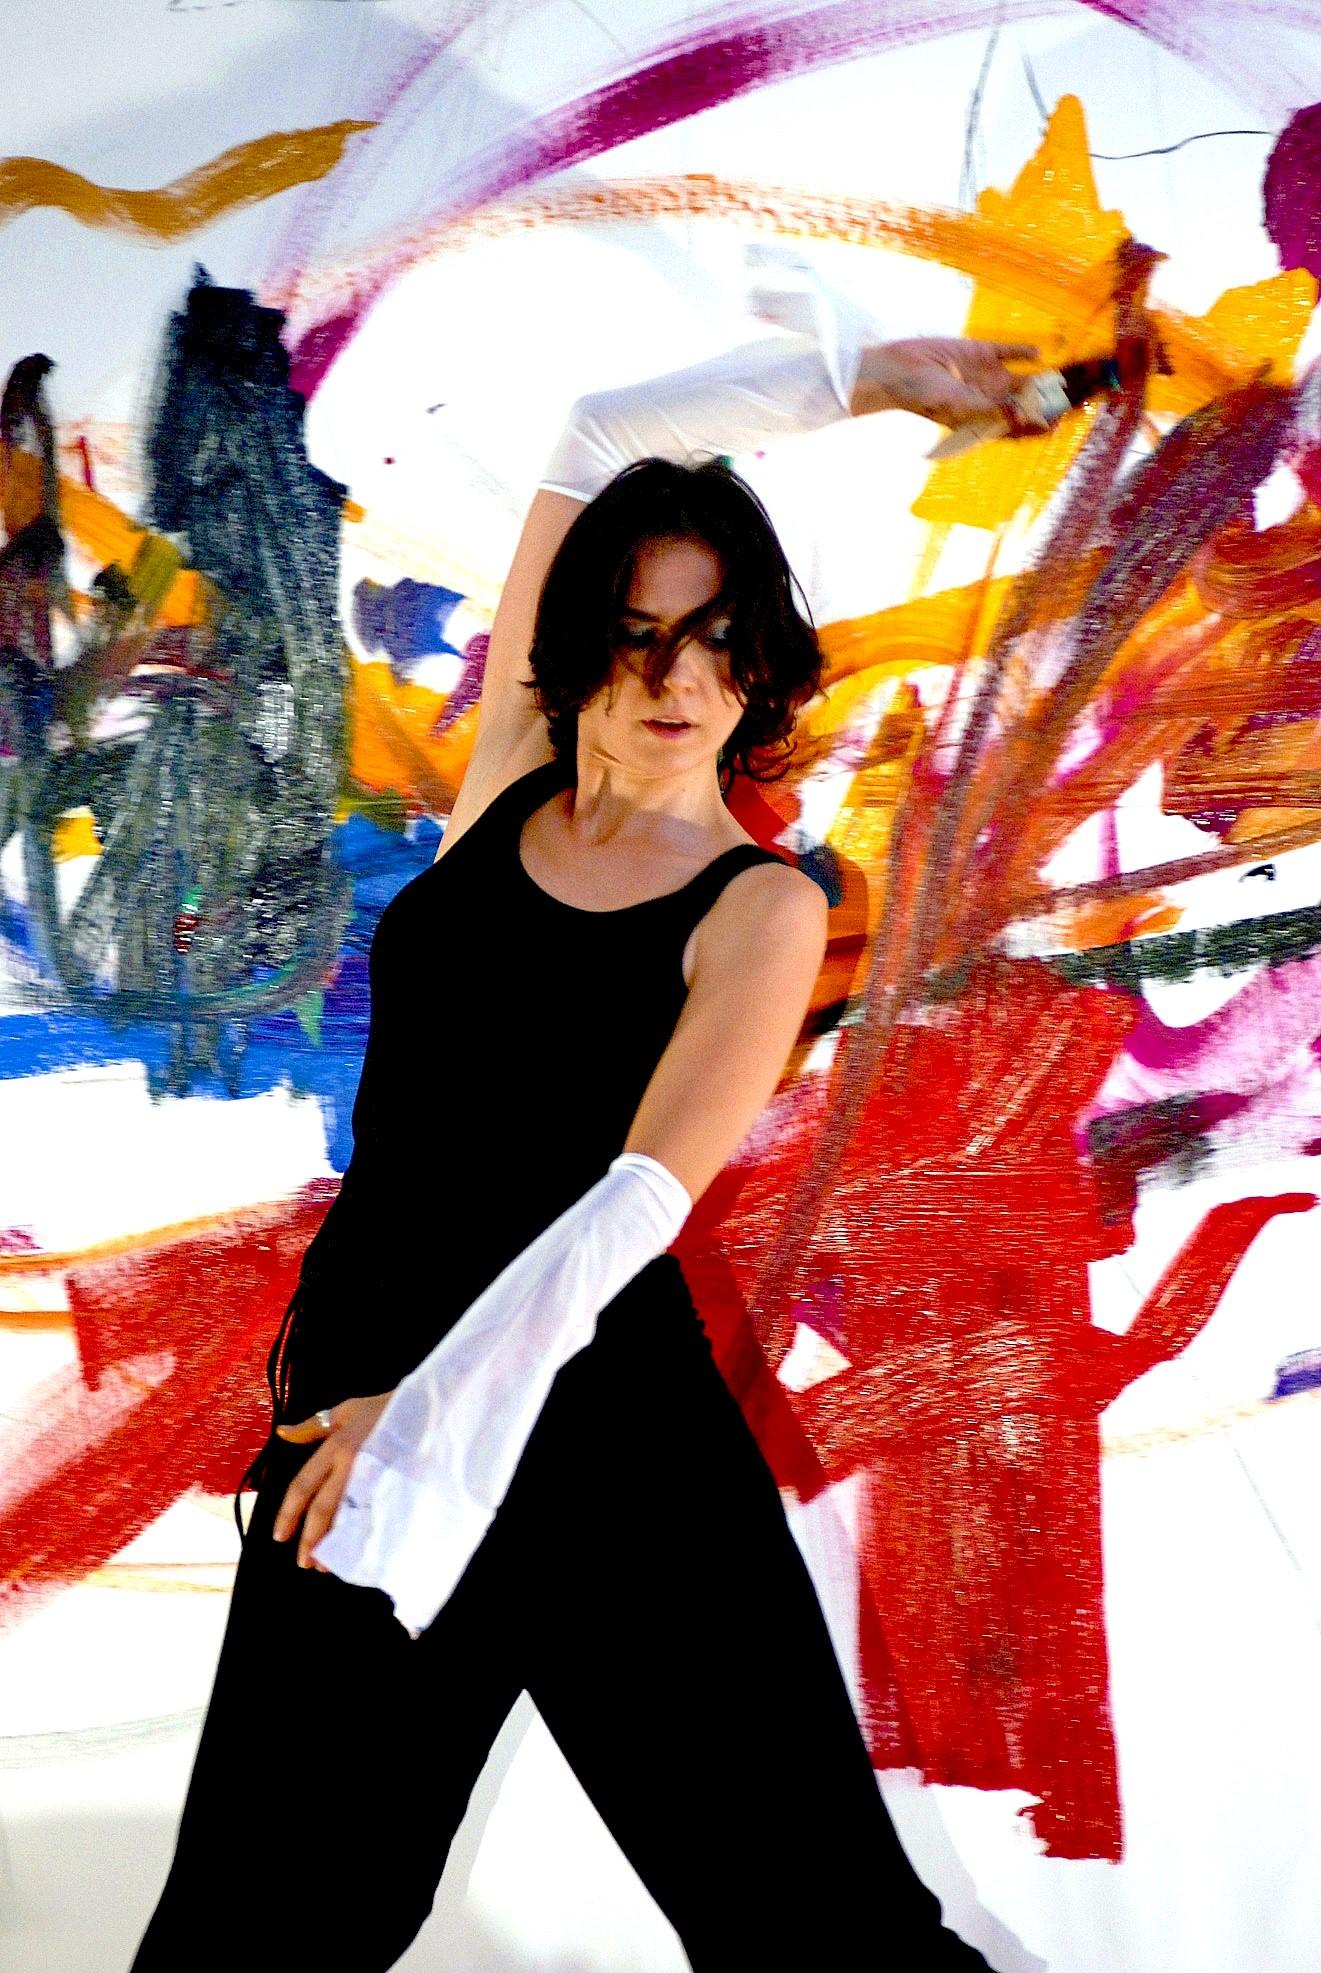 OTTAVIA - Cinzia Fiaschi action painting (Fonte foto comune di Certaldo)